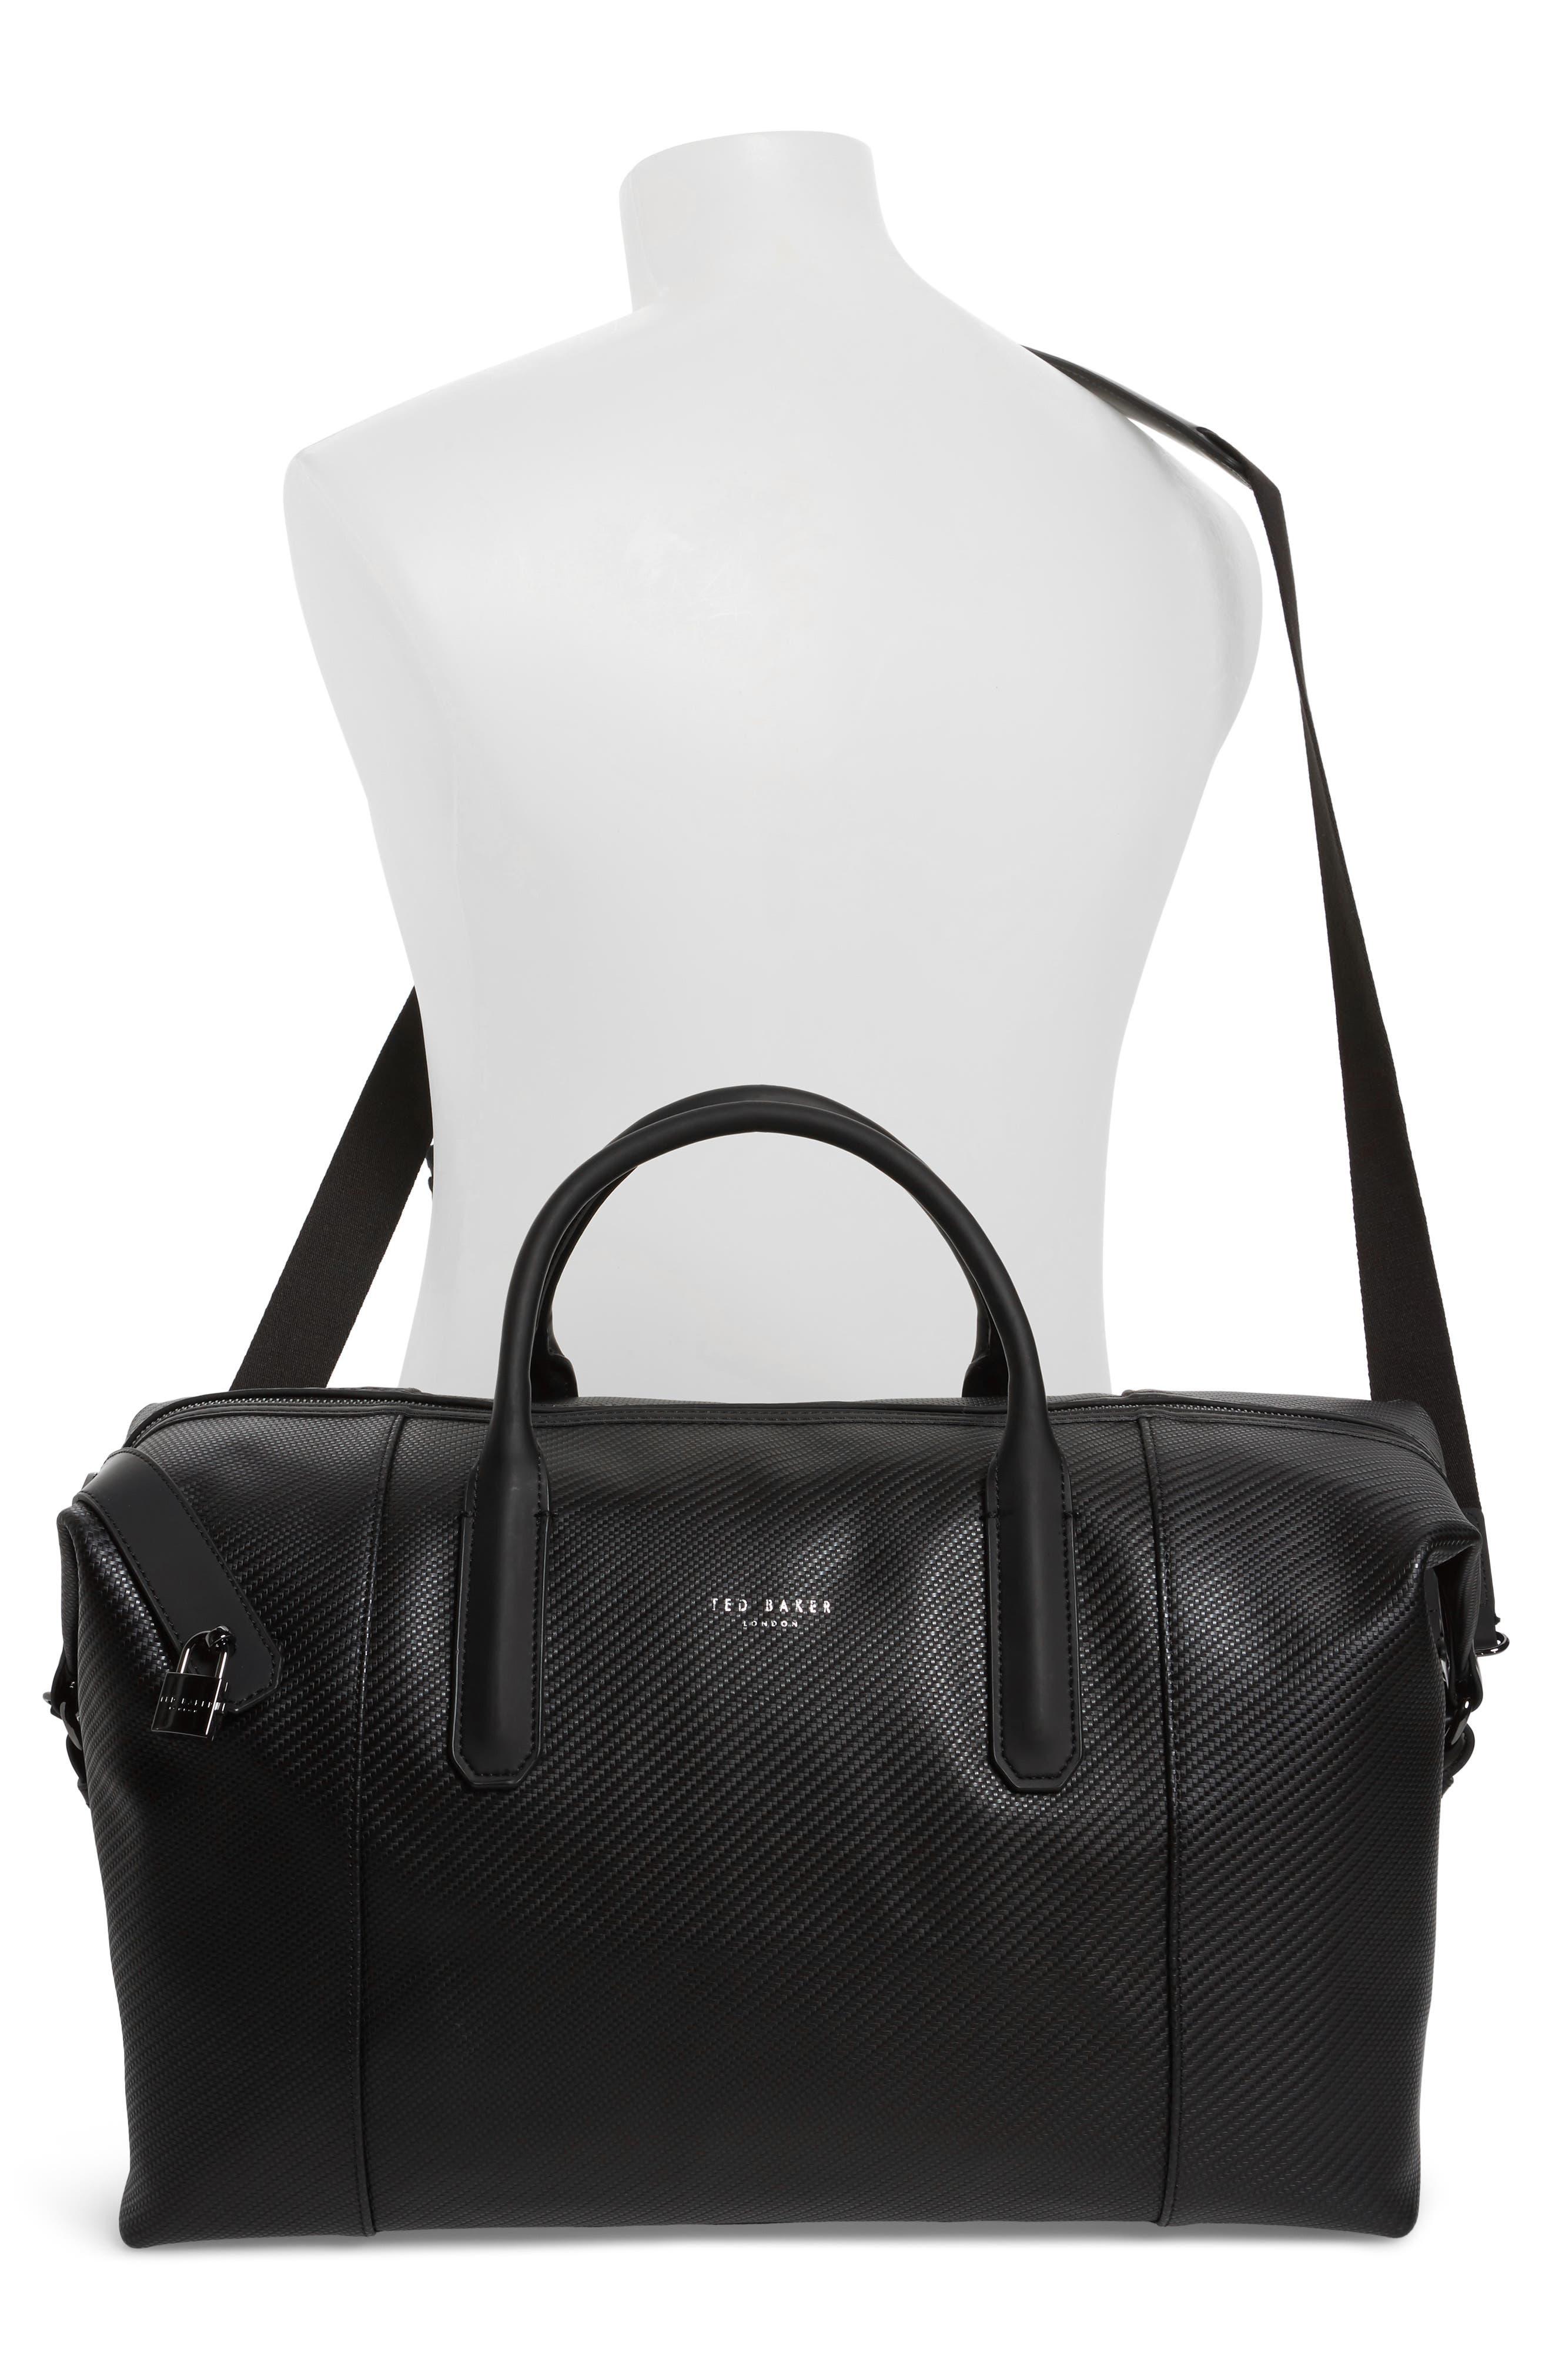 Novana Leather Duffel Bag,                             Alternate thumbnail 2, color,